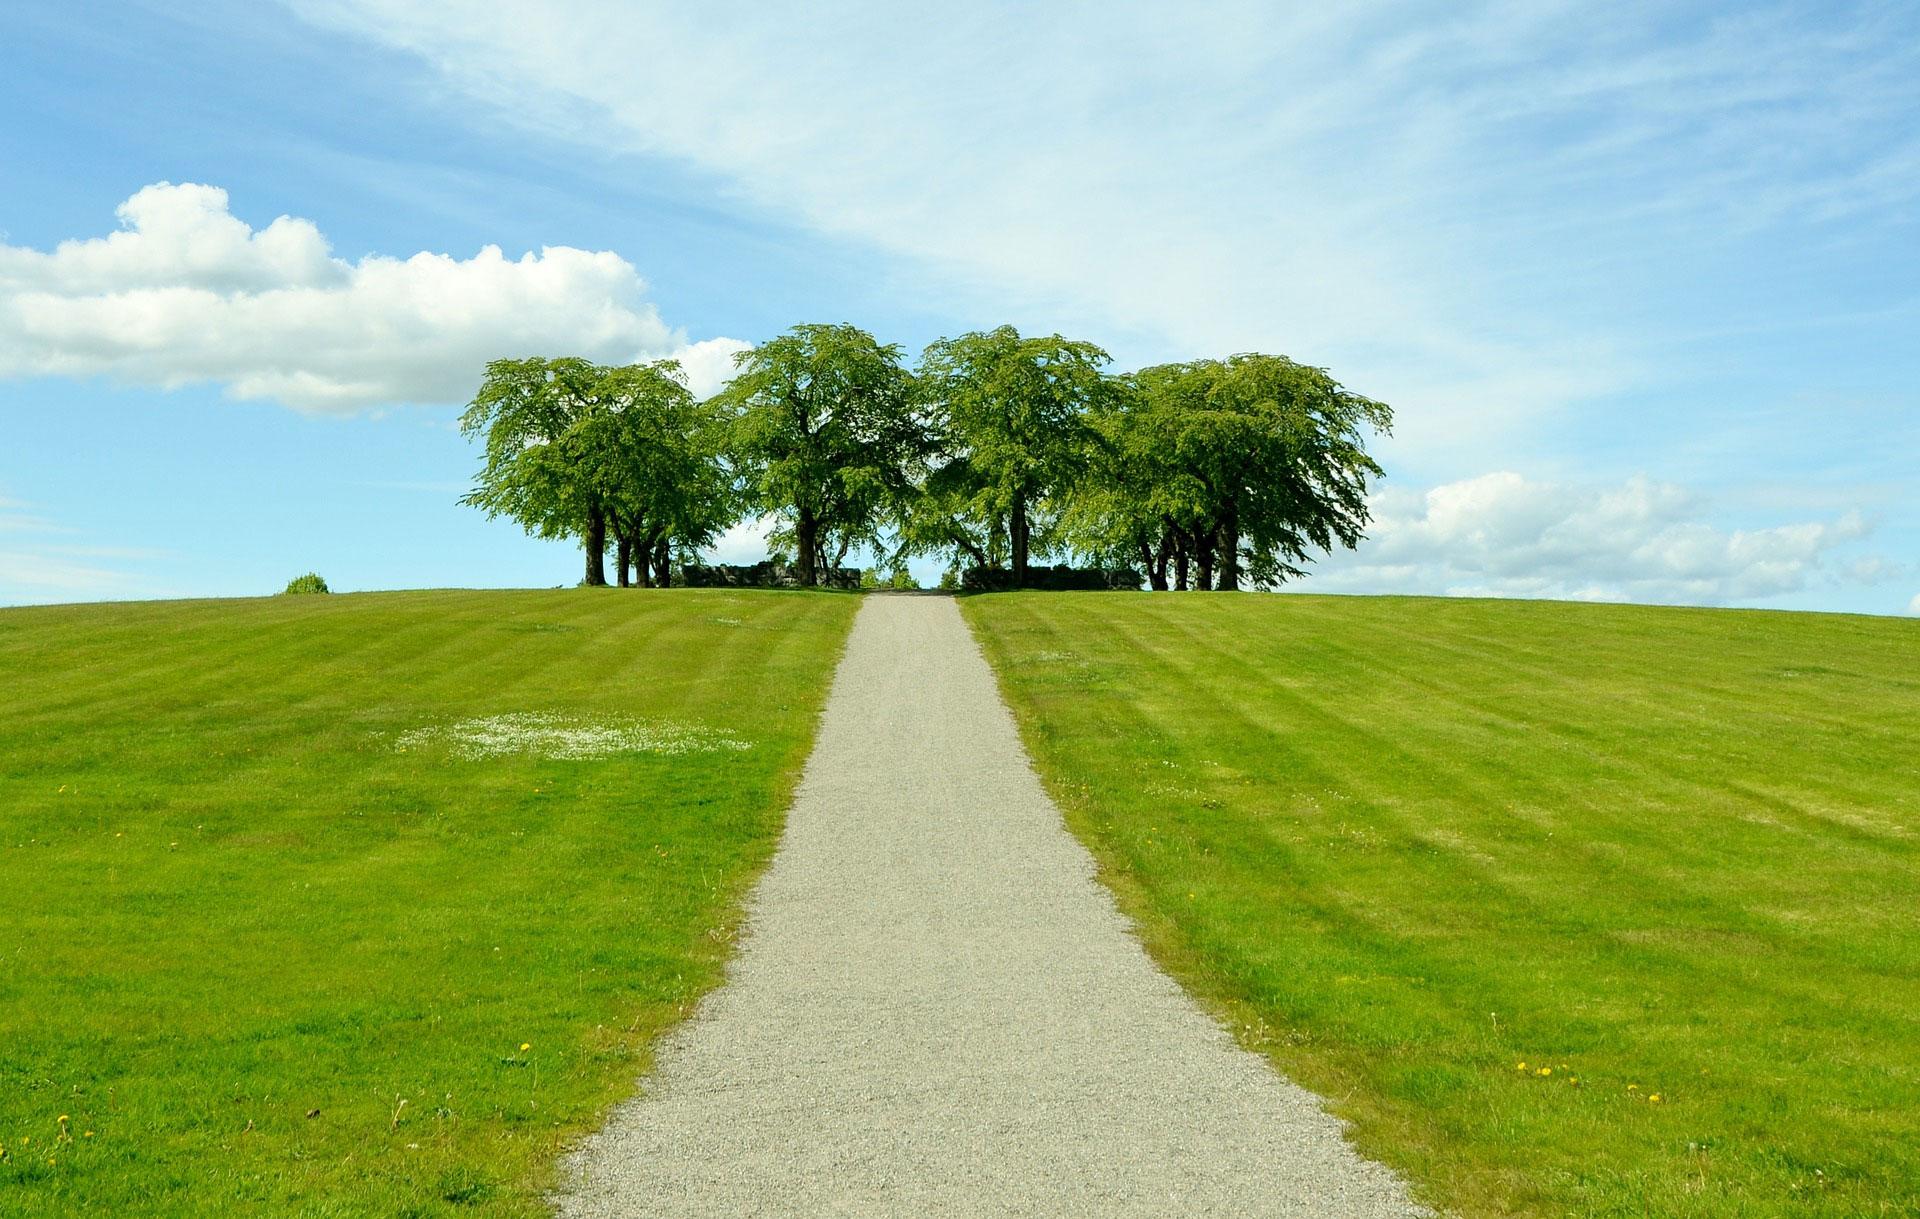 Wiese-Baum